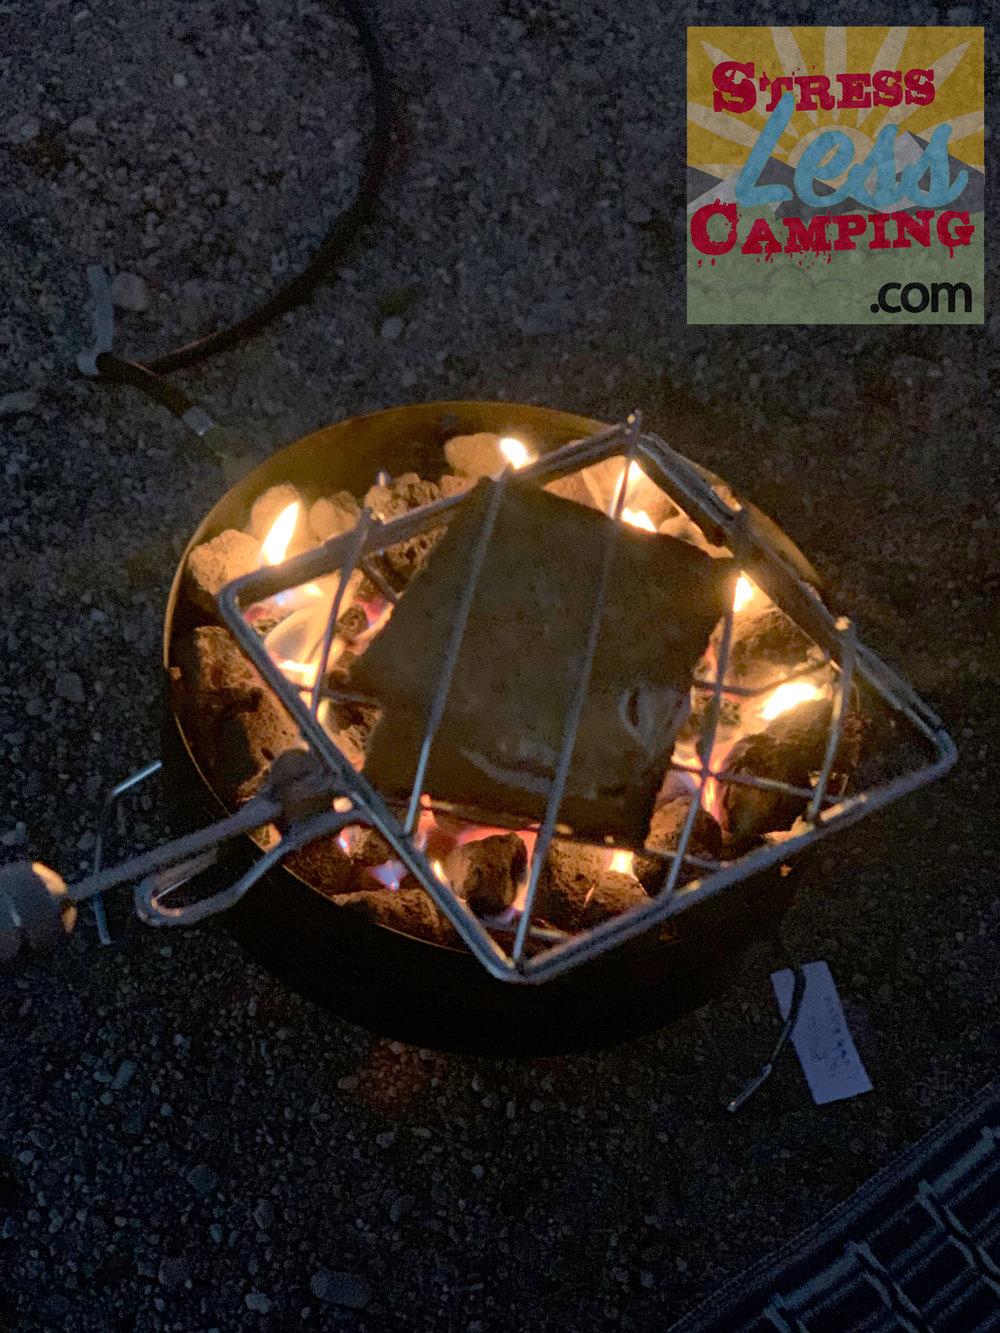 Gas-firepit-making-s'mores.jpg